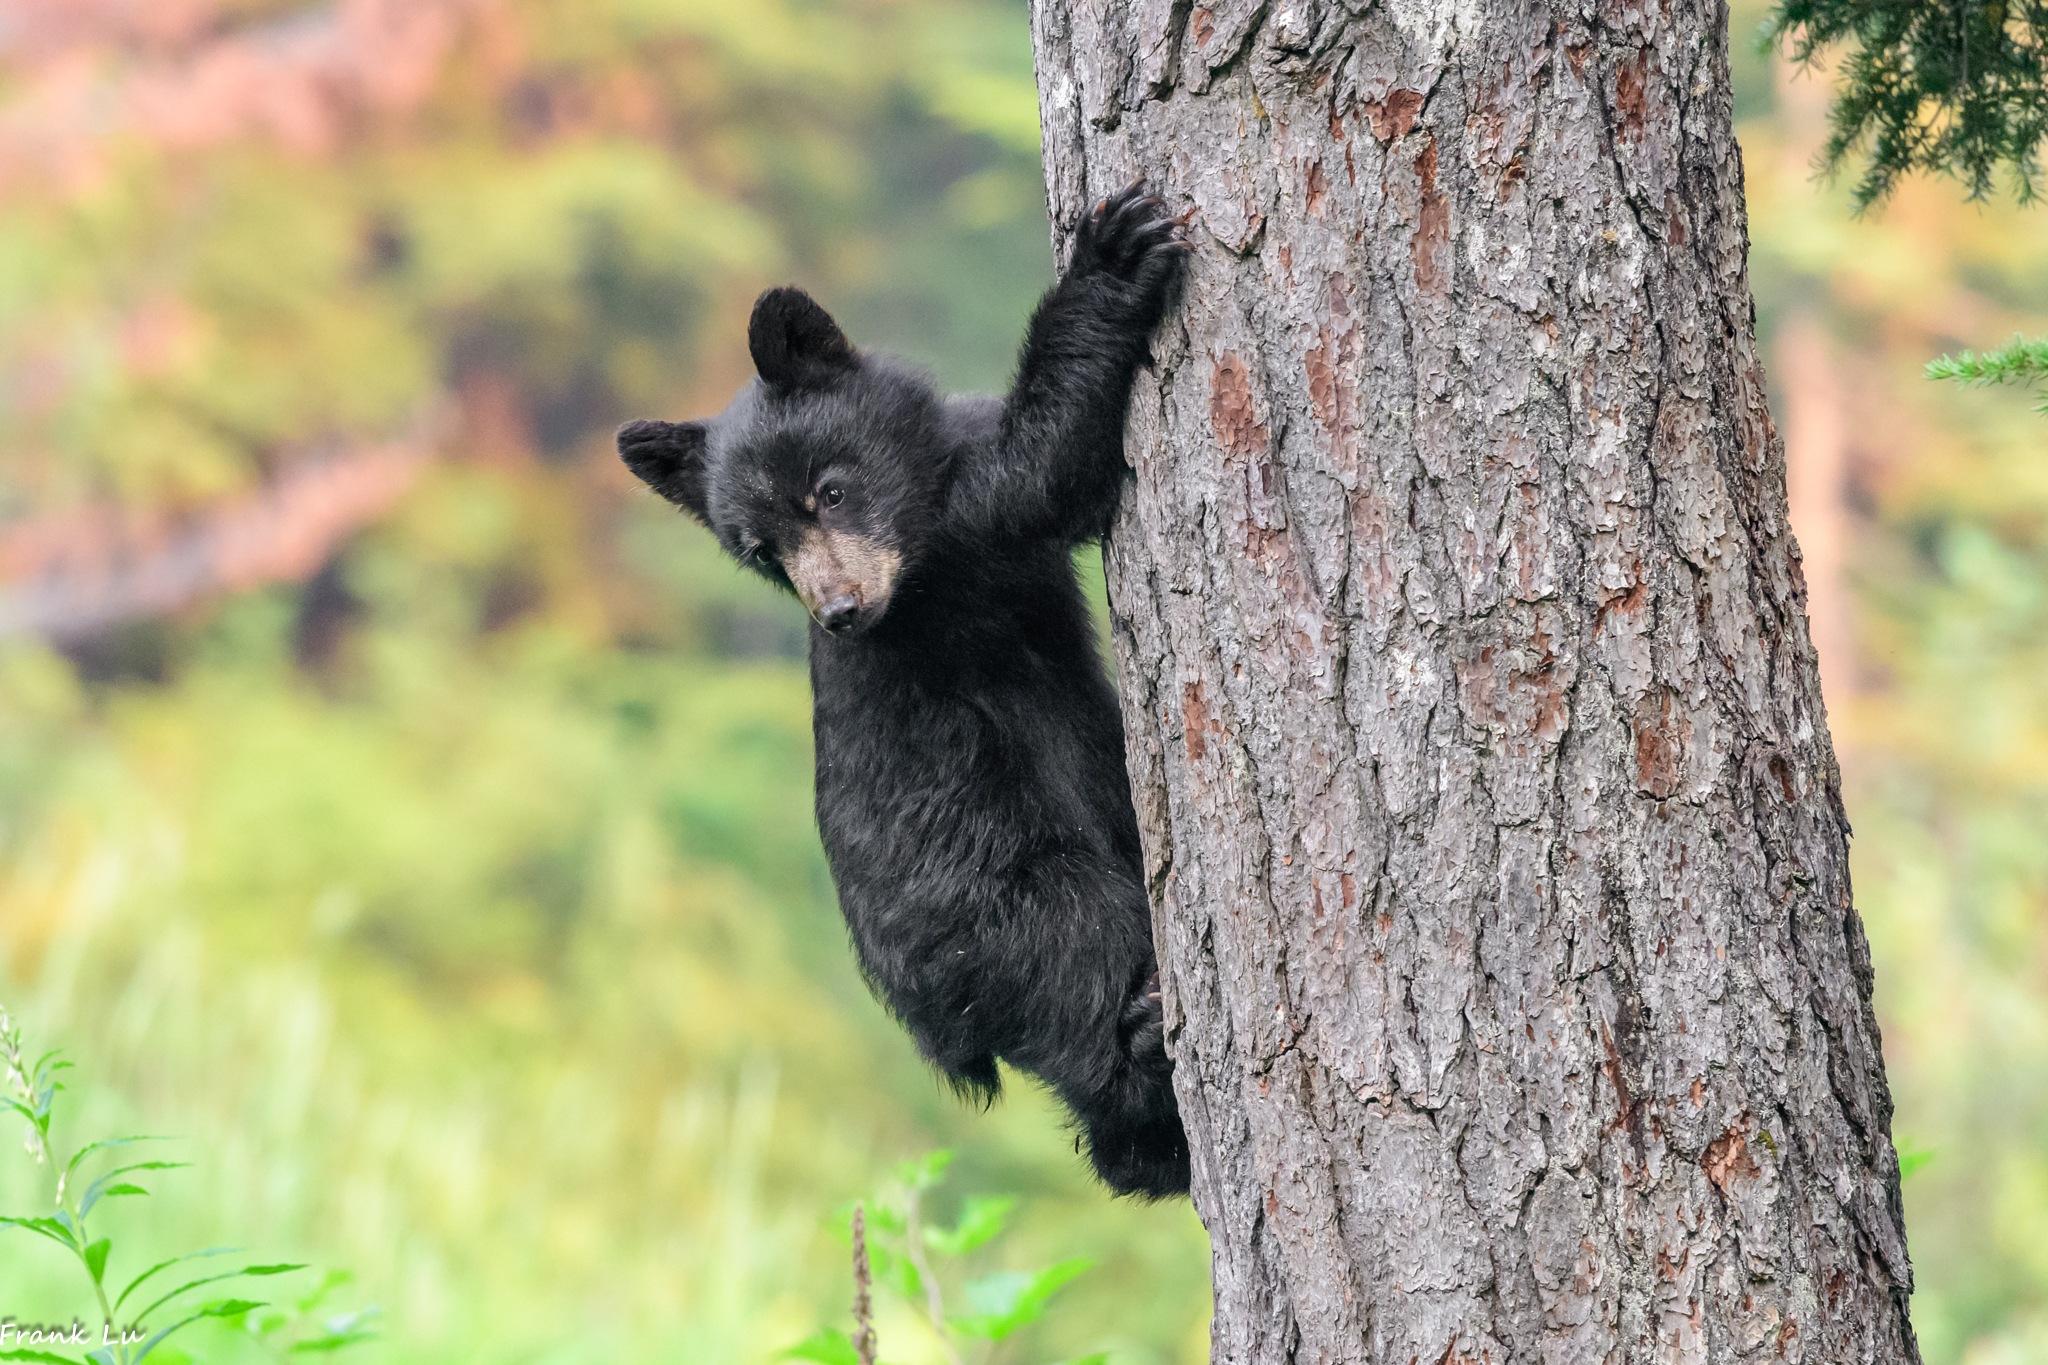 The tree climber by Janmilu